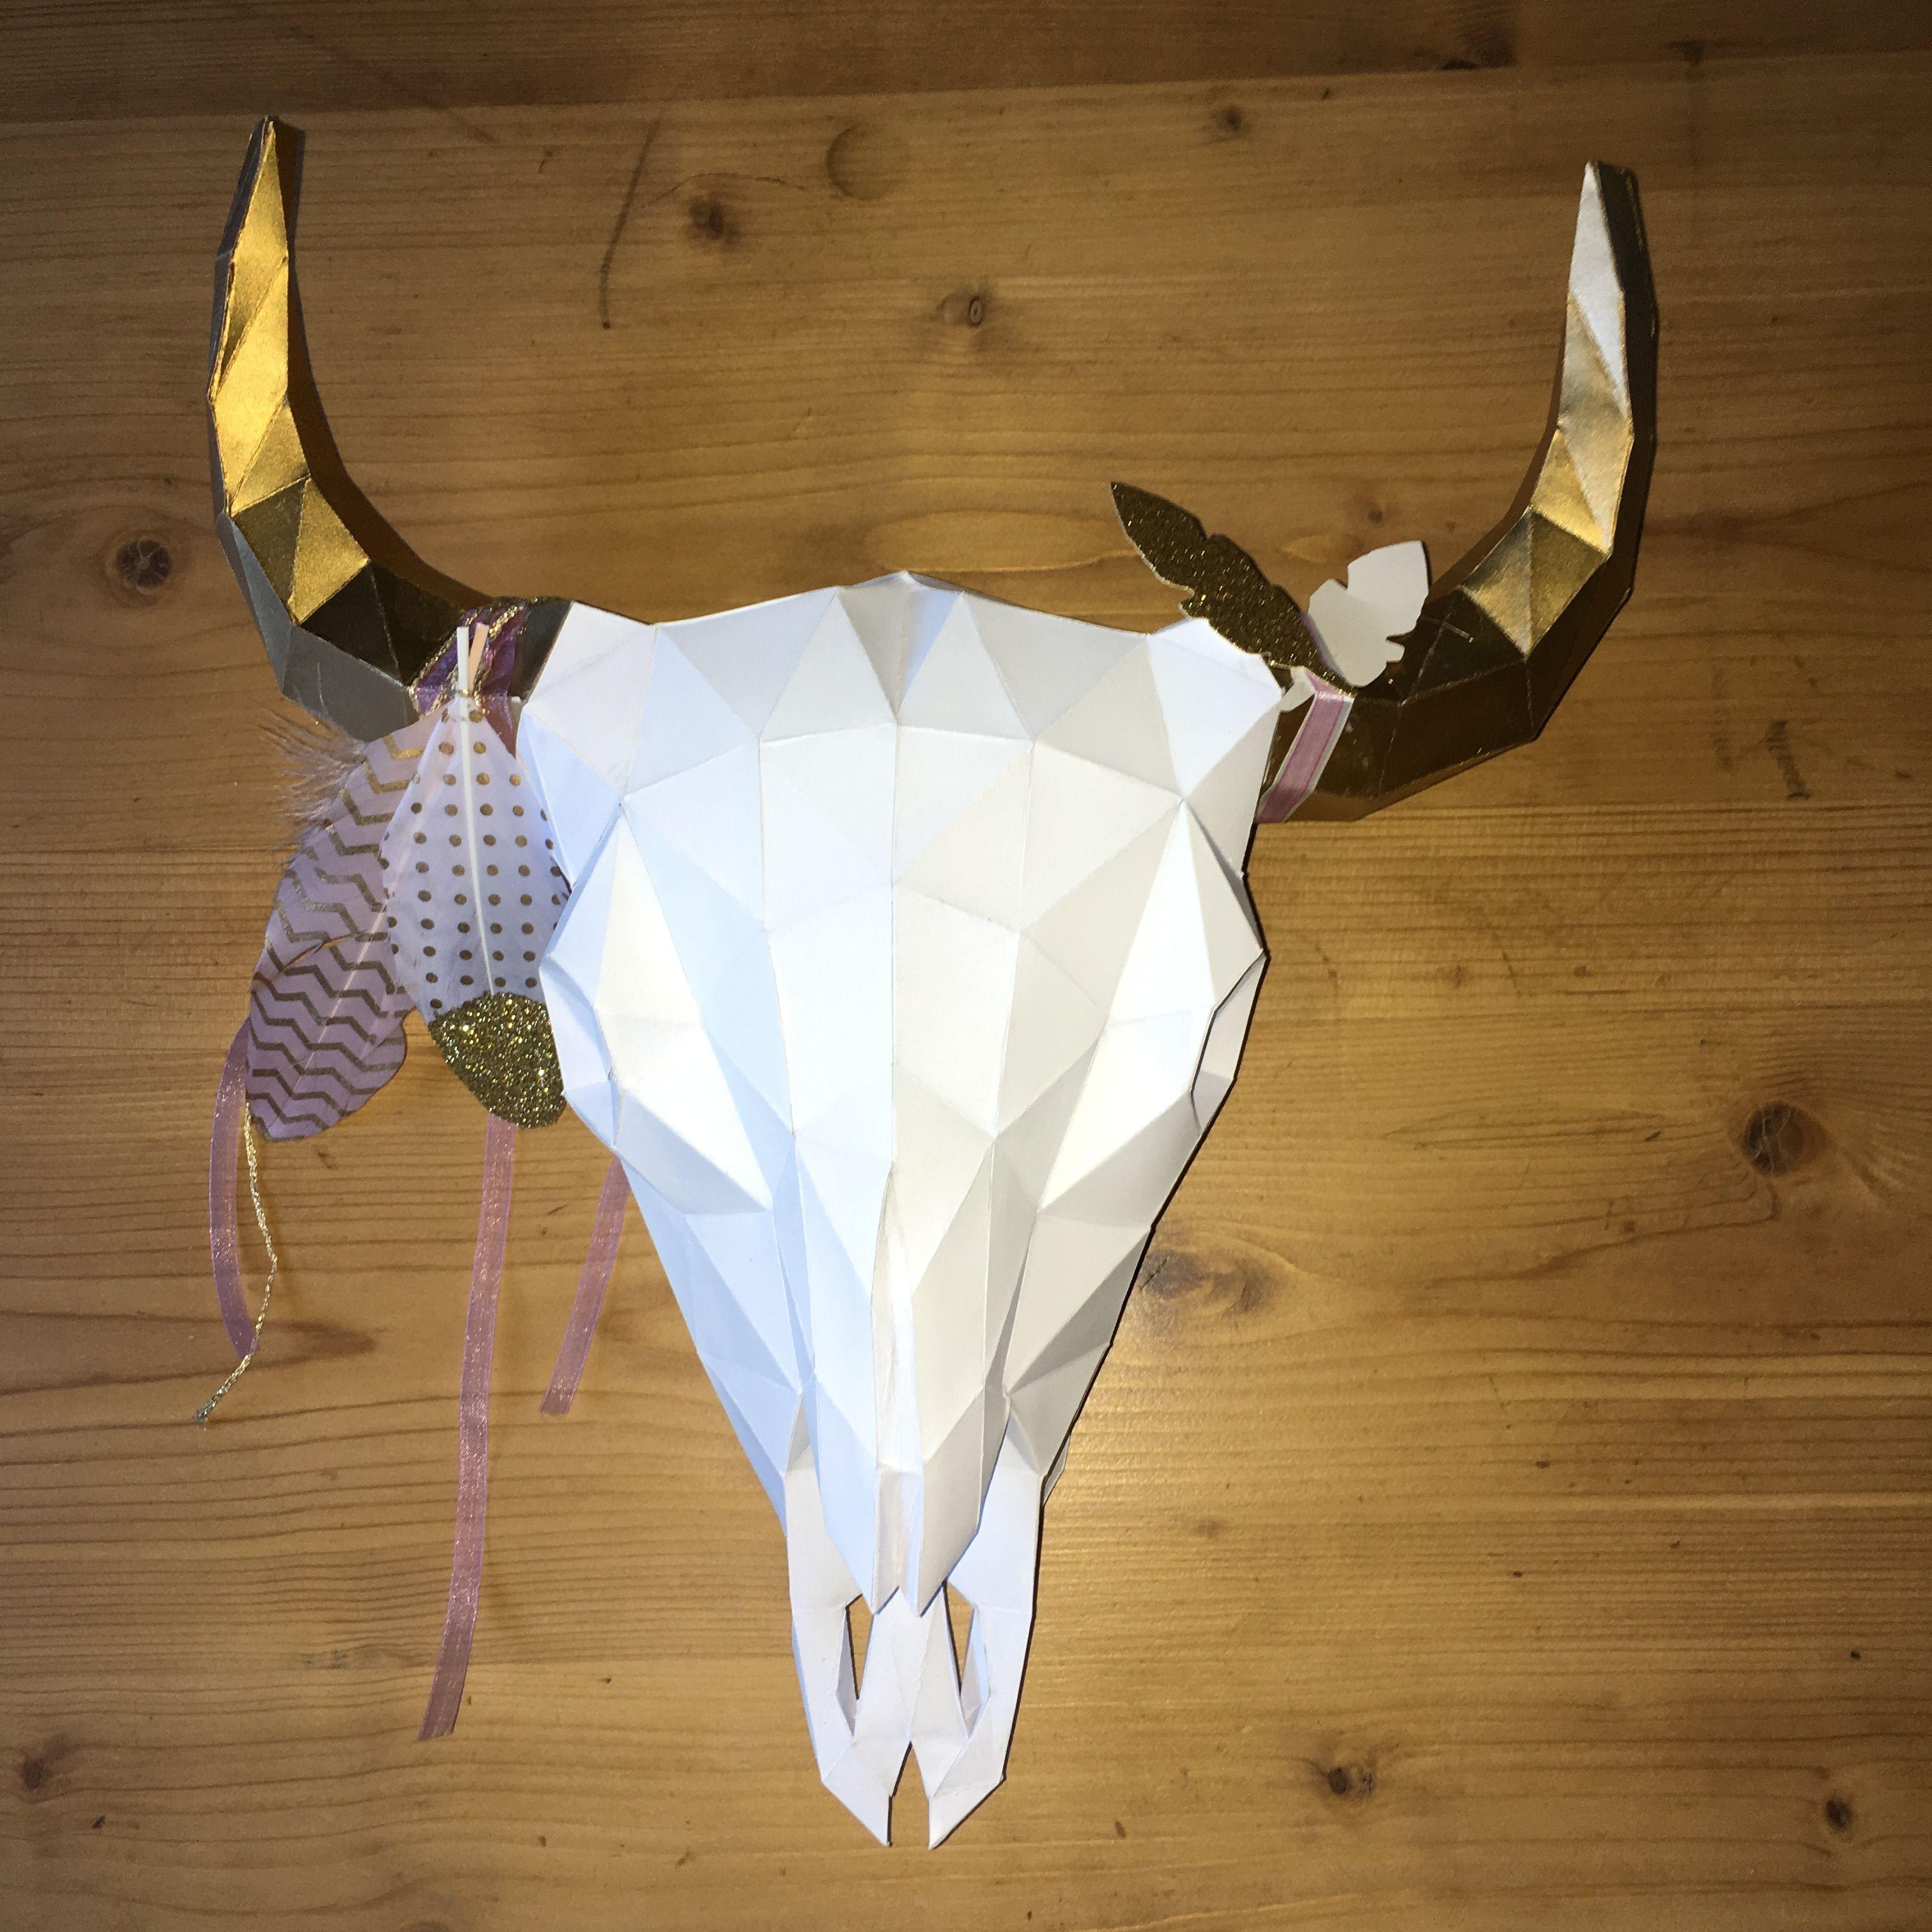 Papercraft Deer Head Buffalo Skull Papercraft Tªte De Bison Trophée Trophy